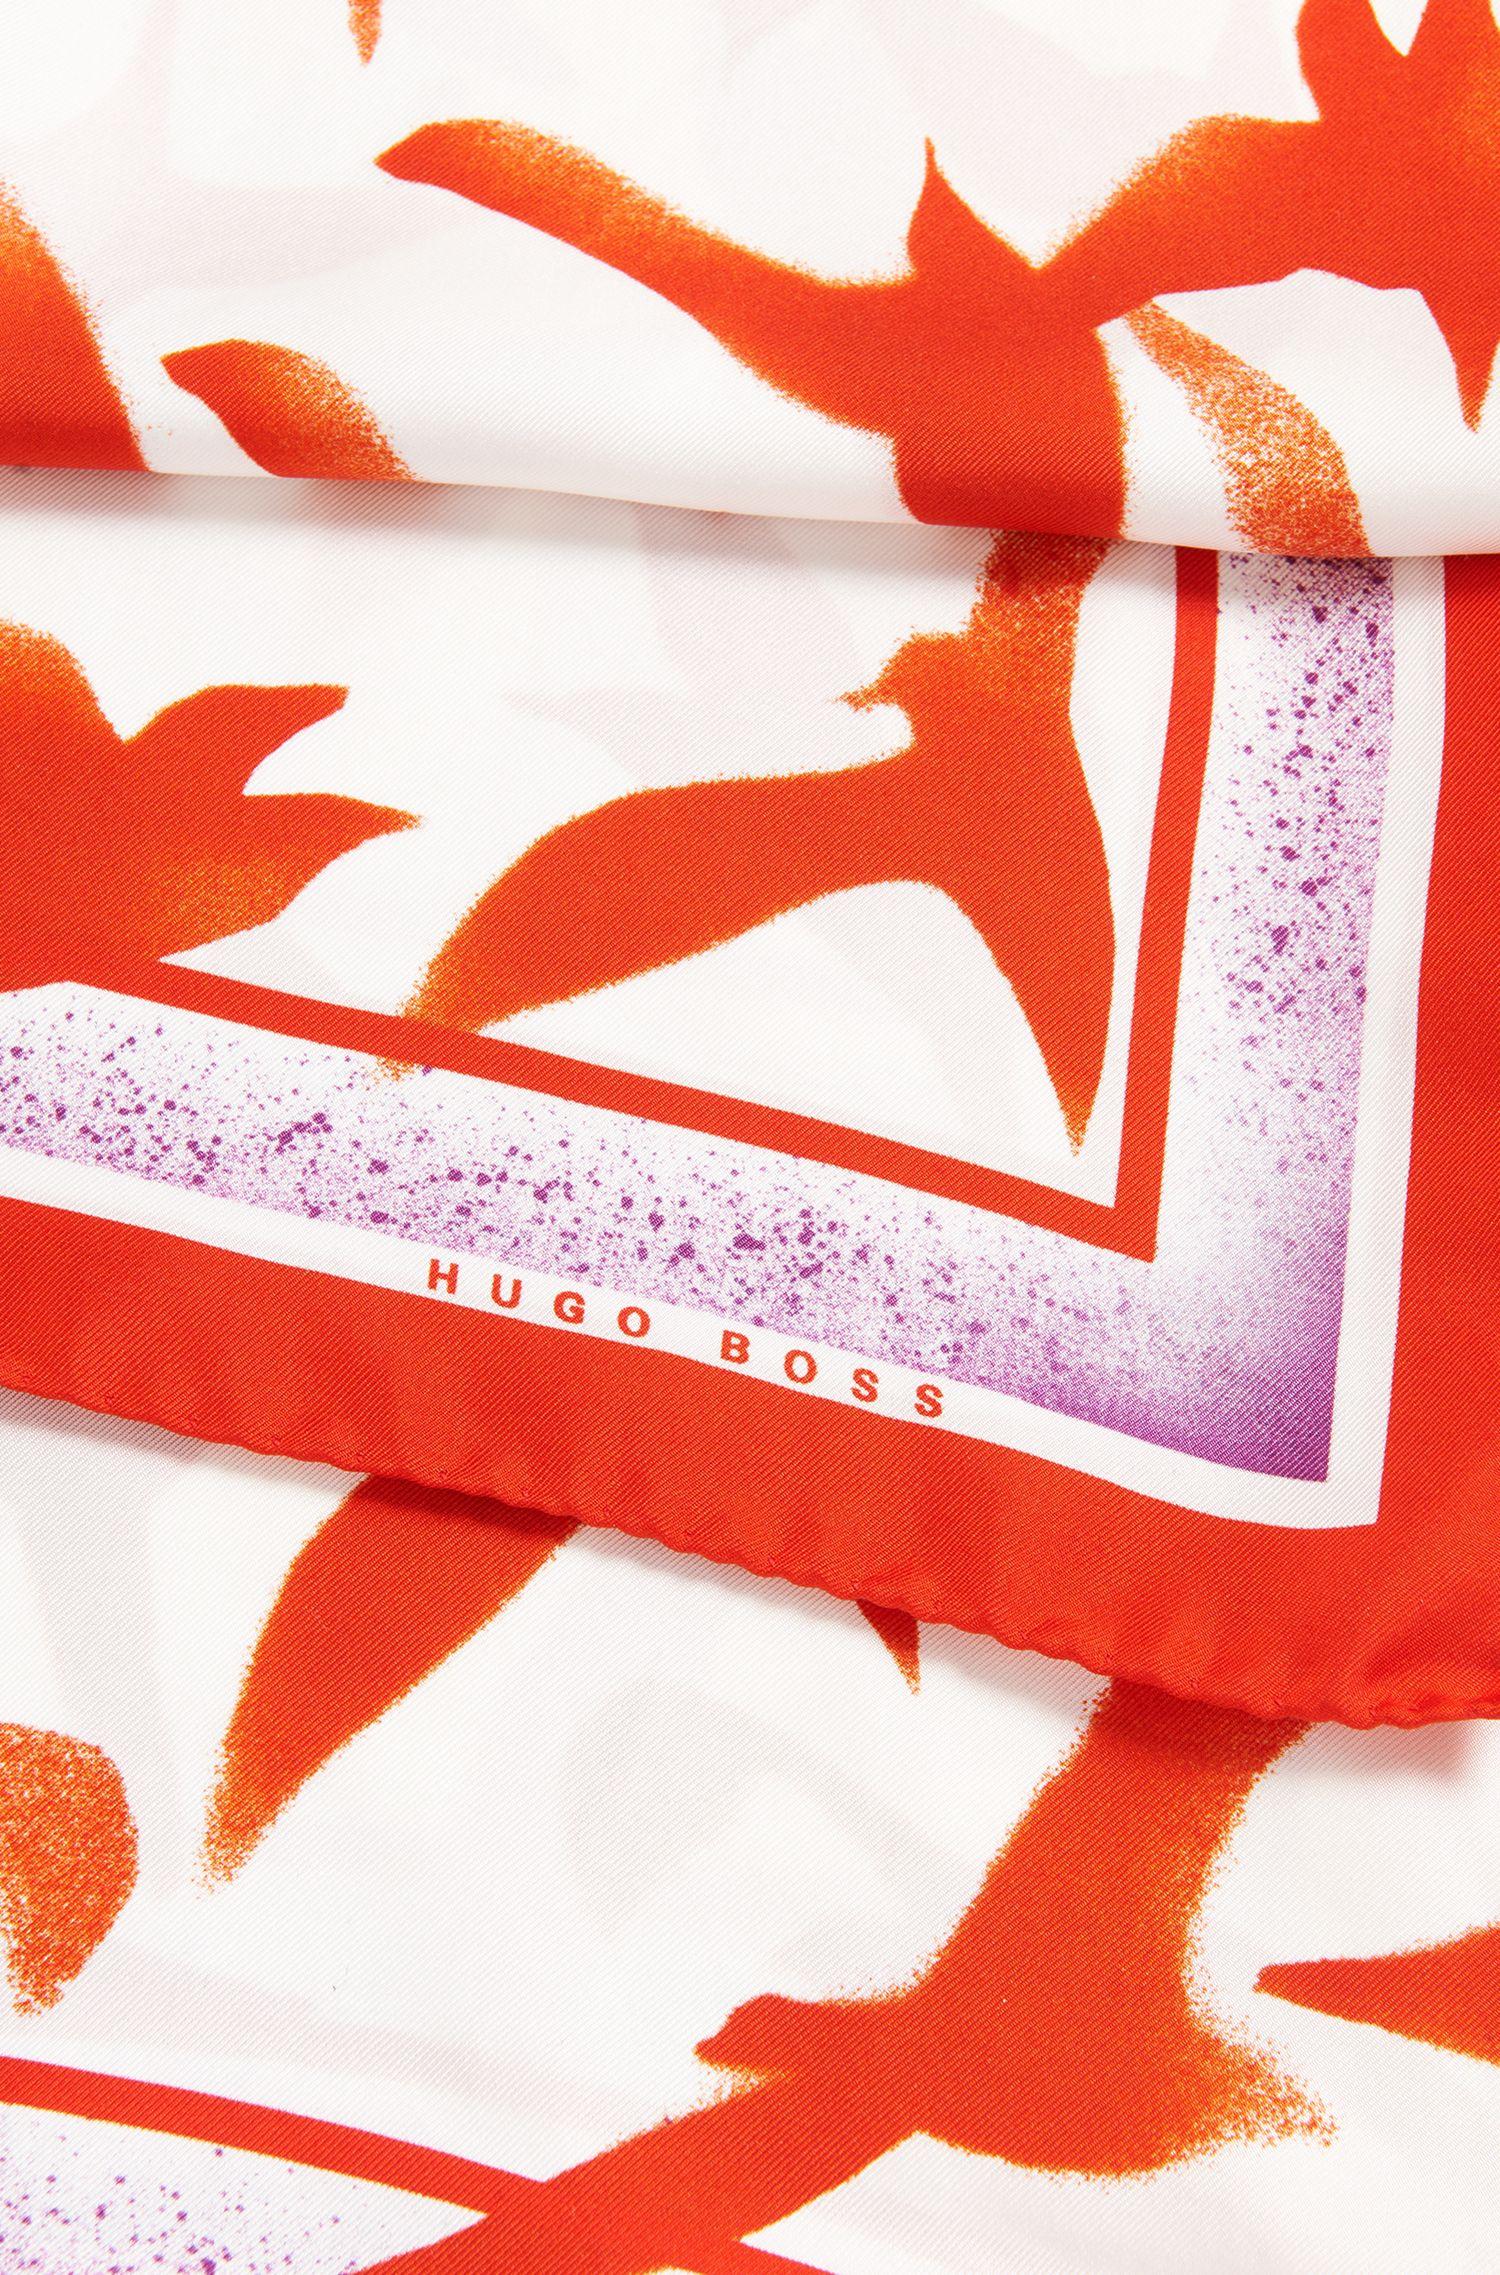 Foulard in pura seta con gabbiani stampati